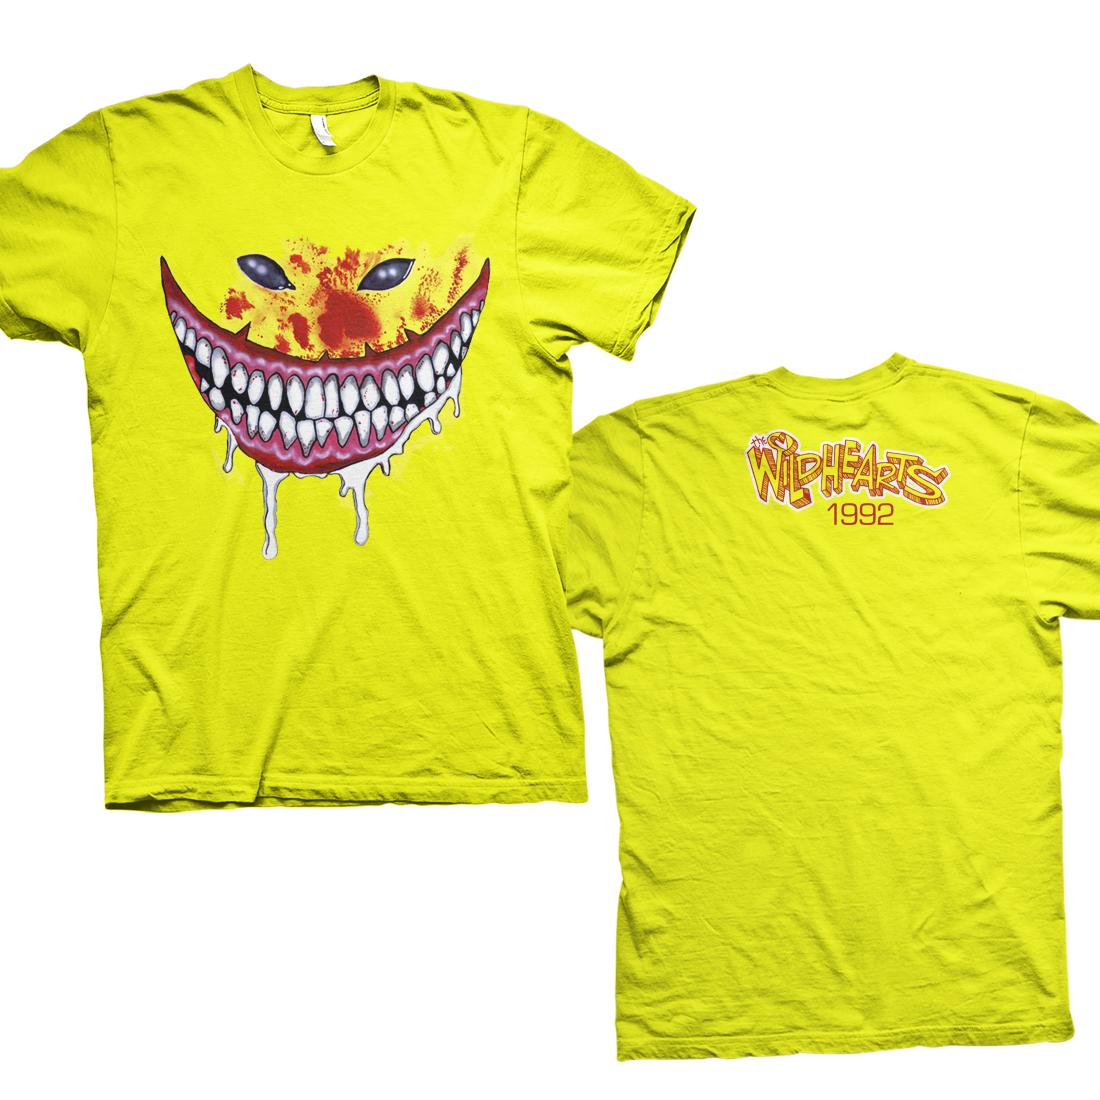 Jumbo OG Smiley Face – Daisy Yellow Tee